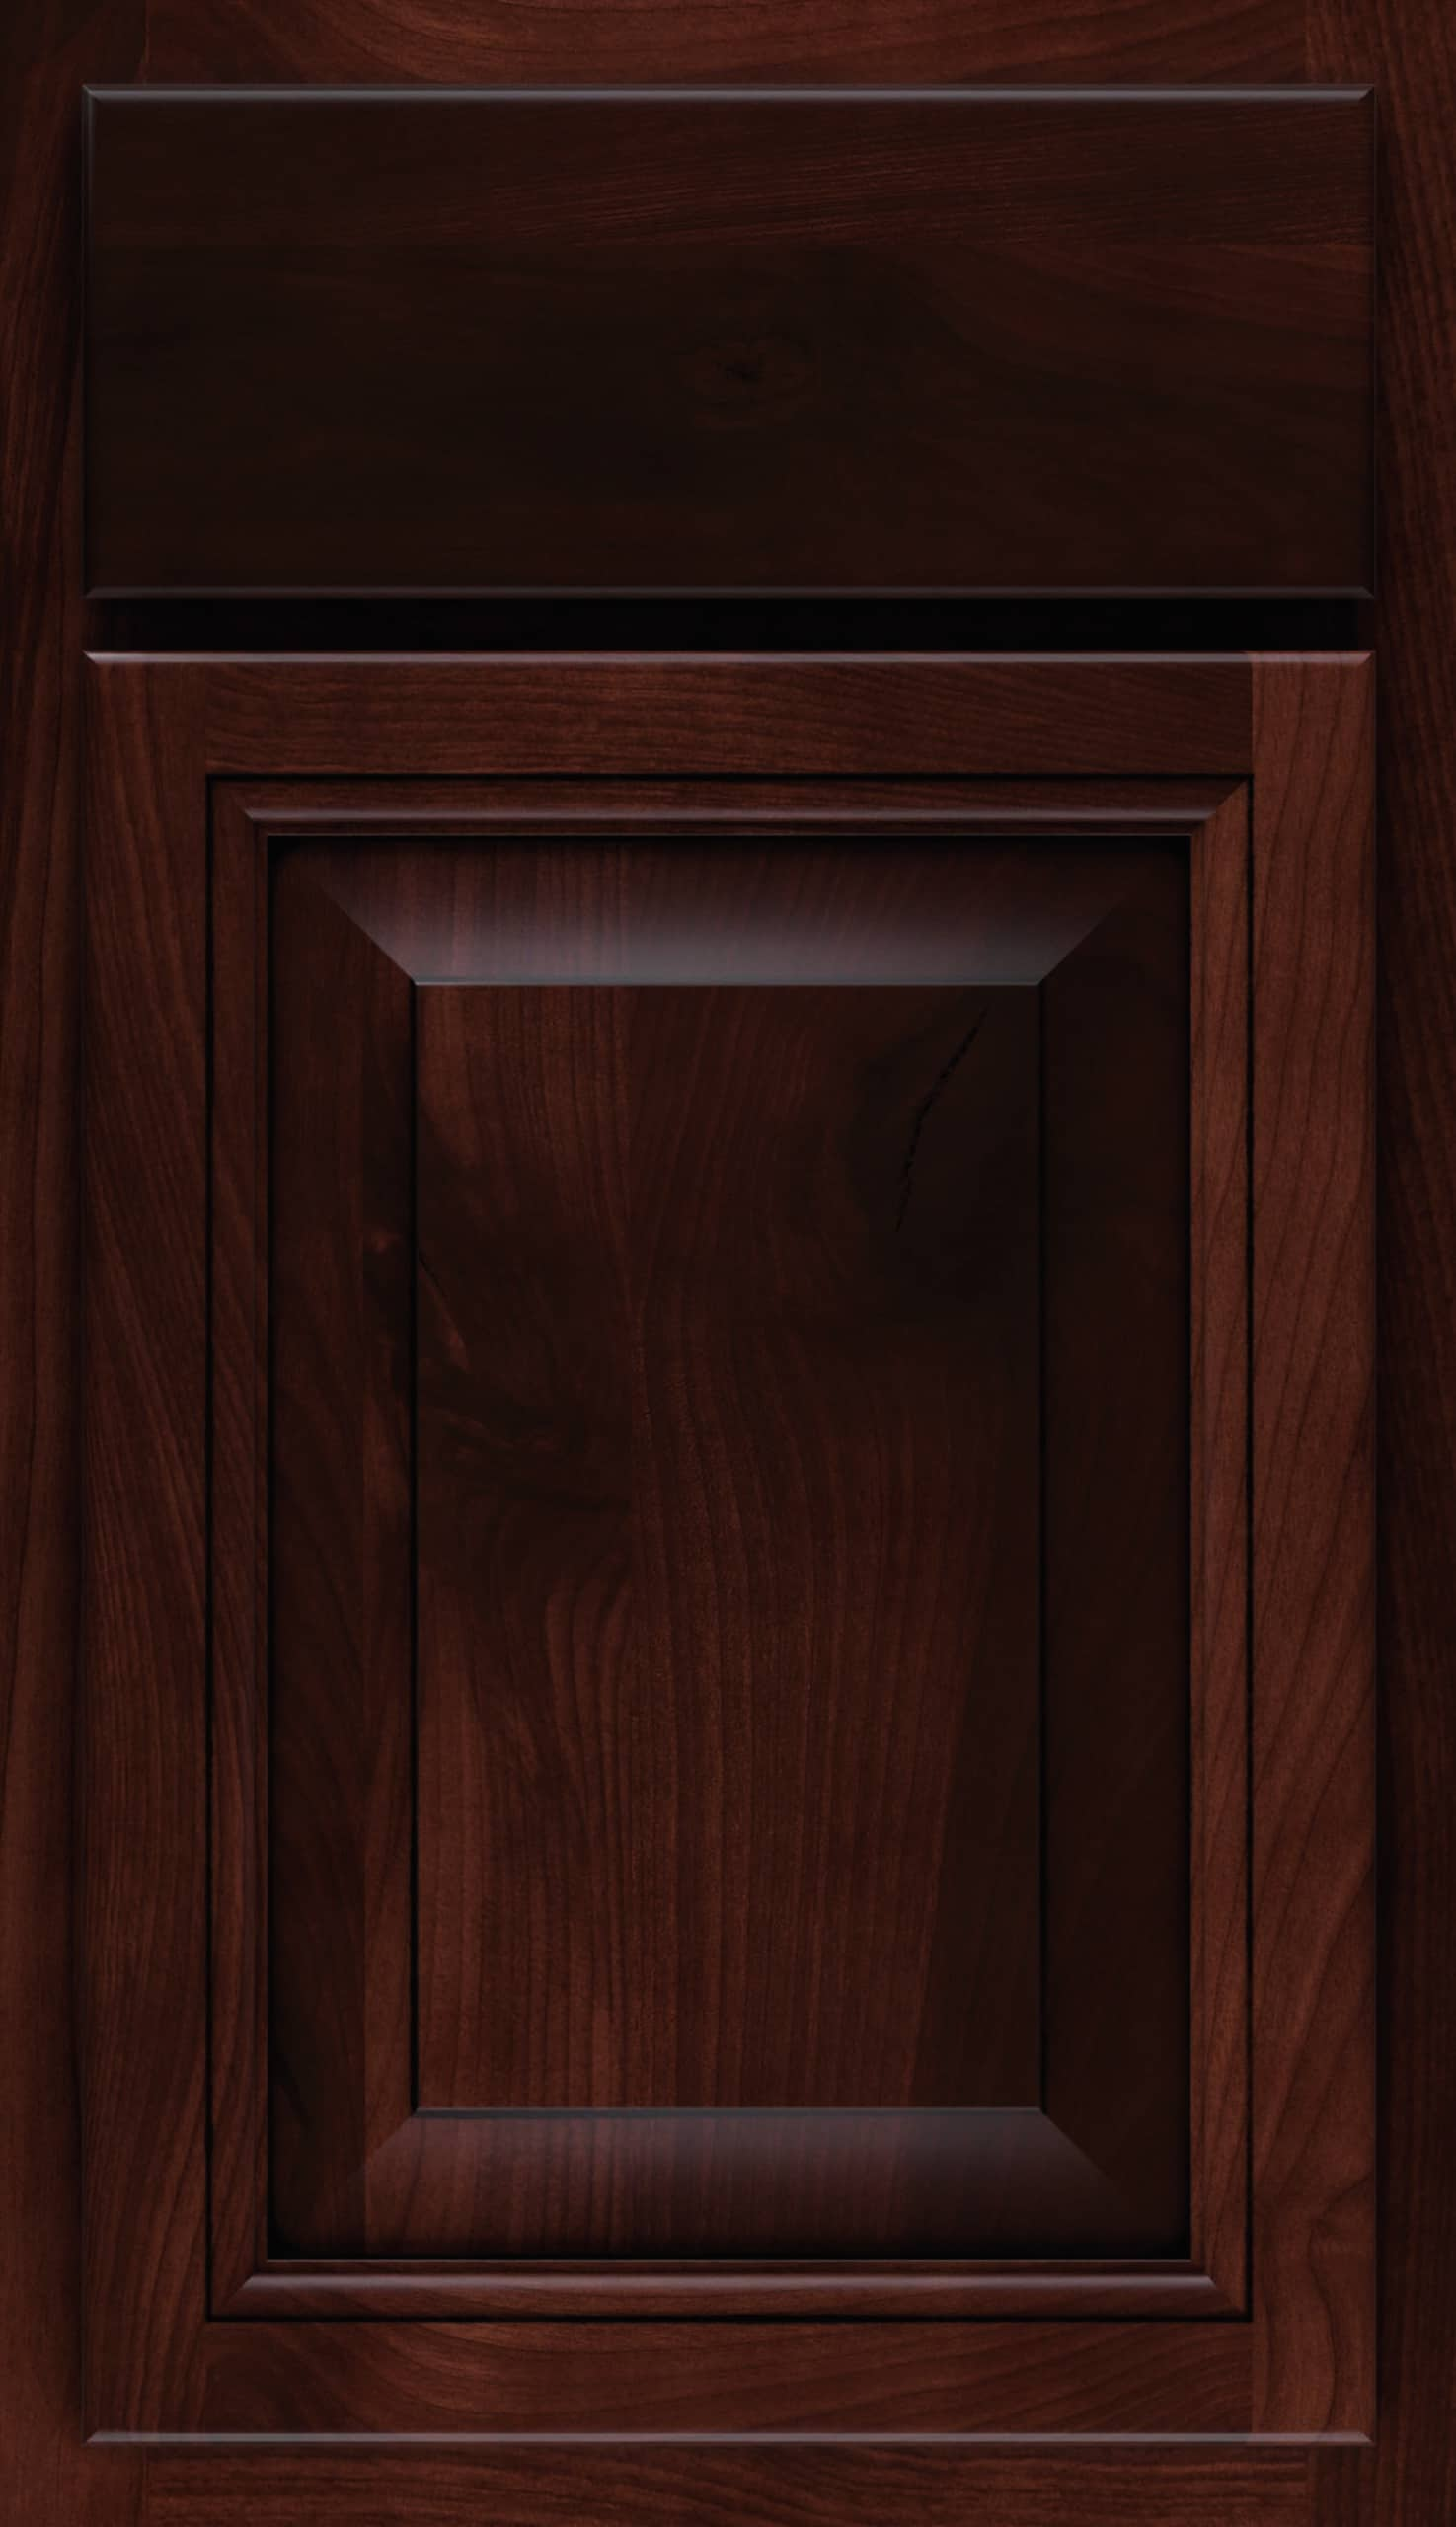 Anderson Rustic - Birch Cinnamon Glaze